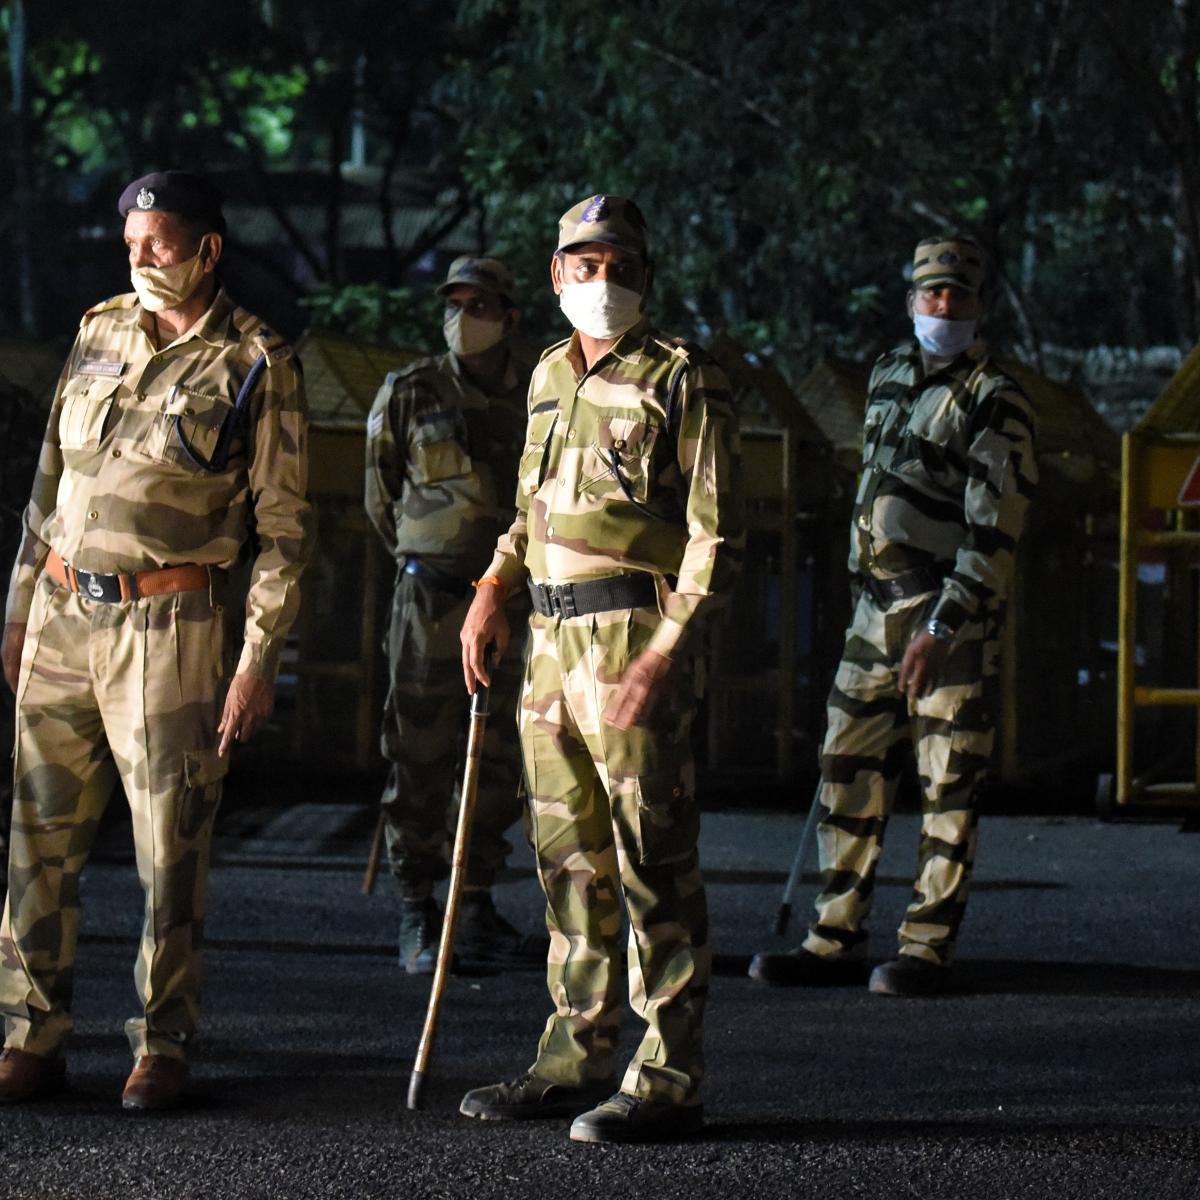 Night curfew in Uttar Pradesh cities of Lucknow, Varanasi, Kanpur as COVID-19 cases surge